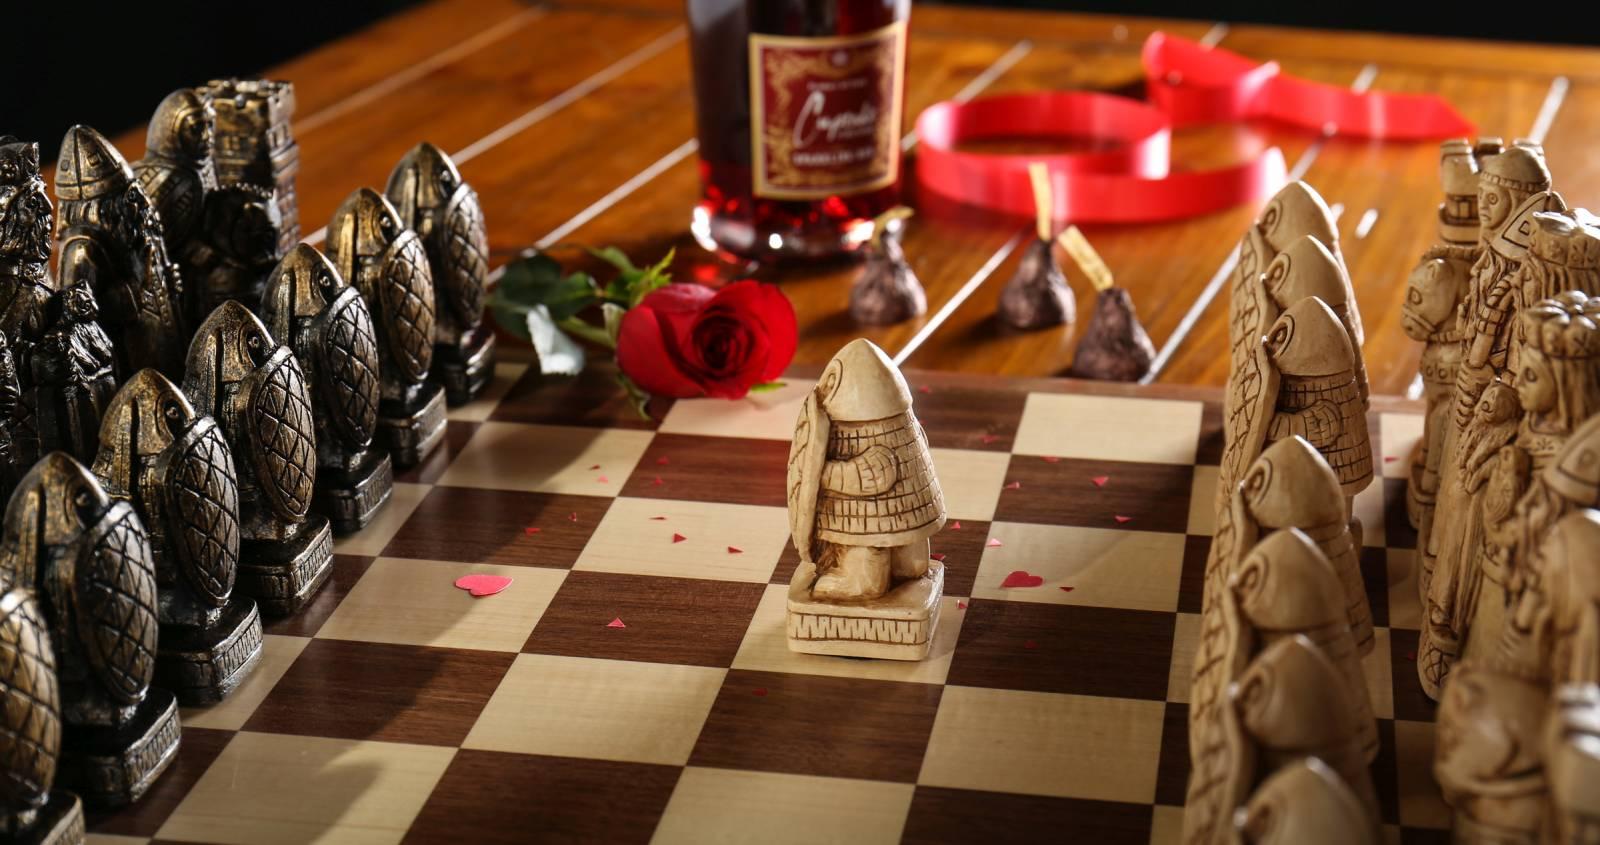 Chess set for Valentine